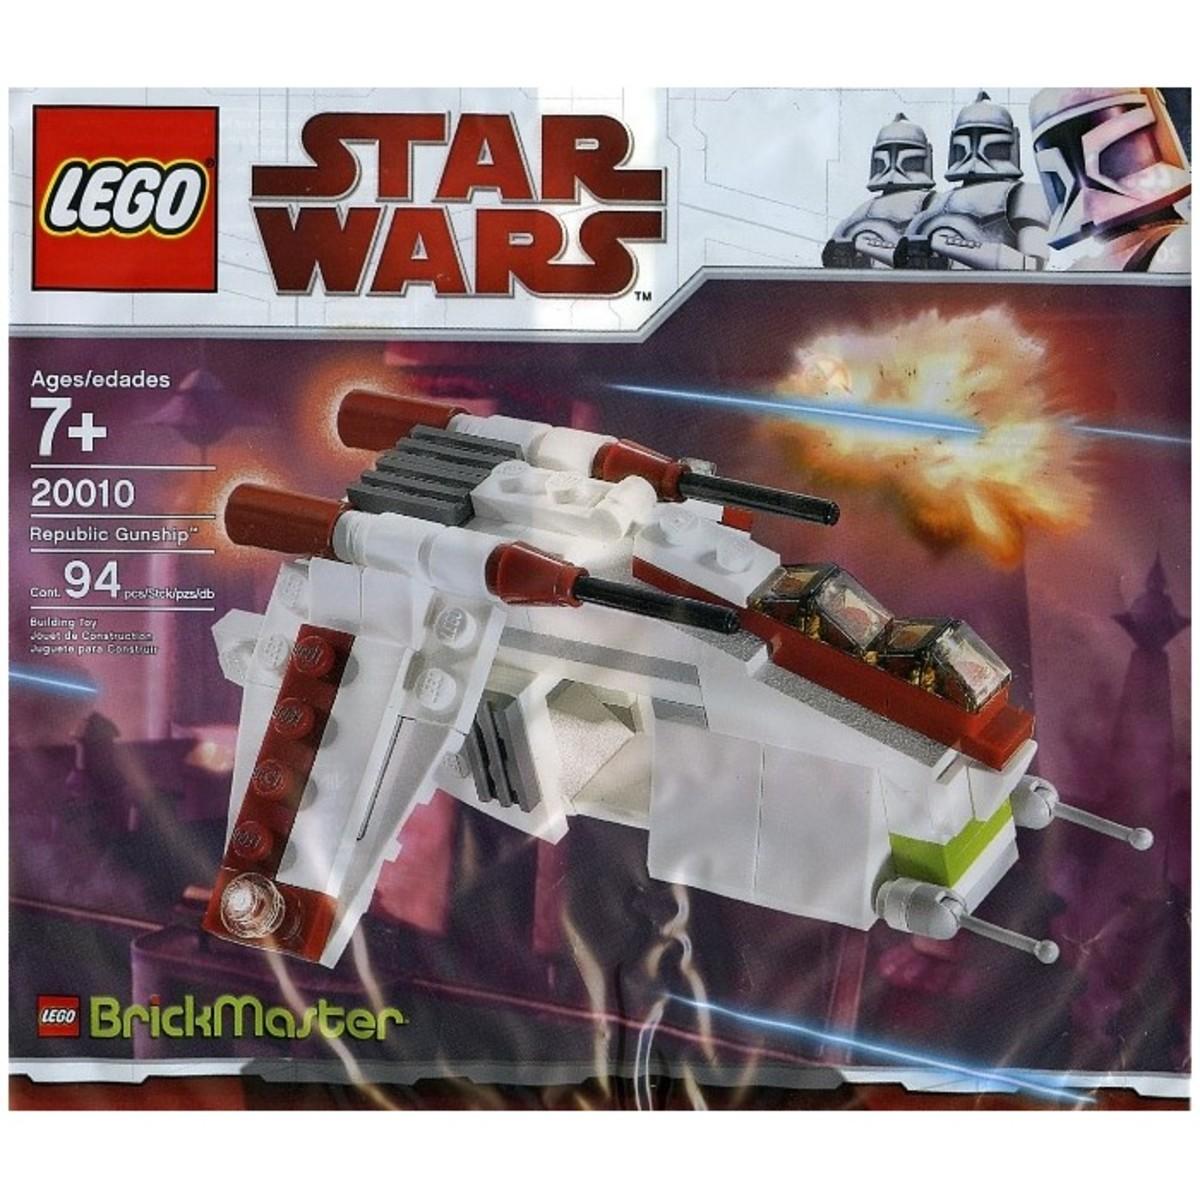 LEGO Star Wars Republic Gunship 20010 Bag